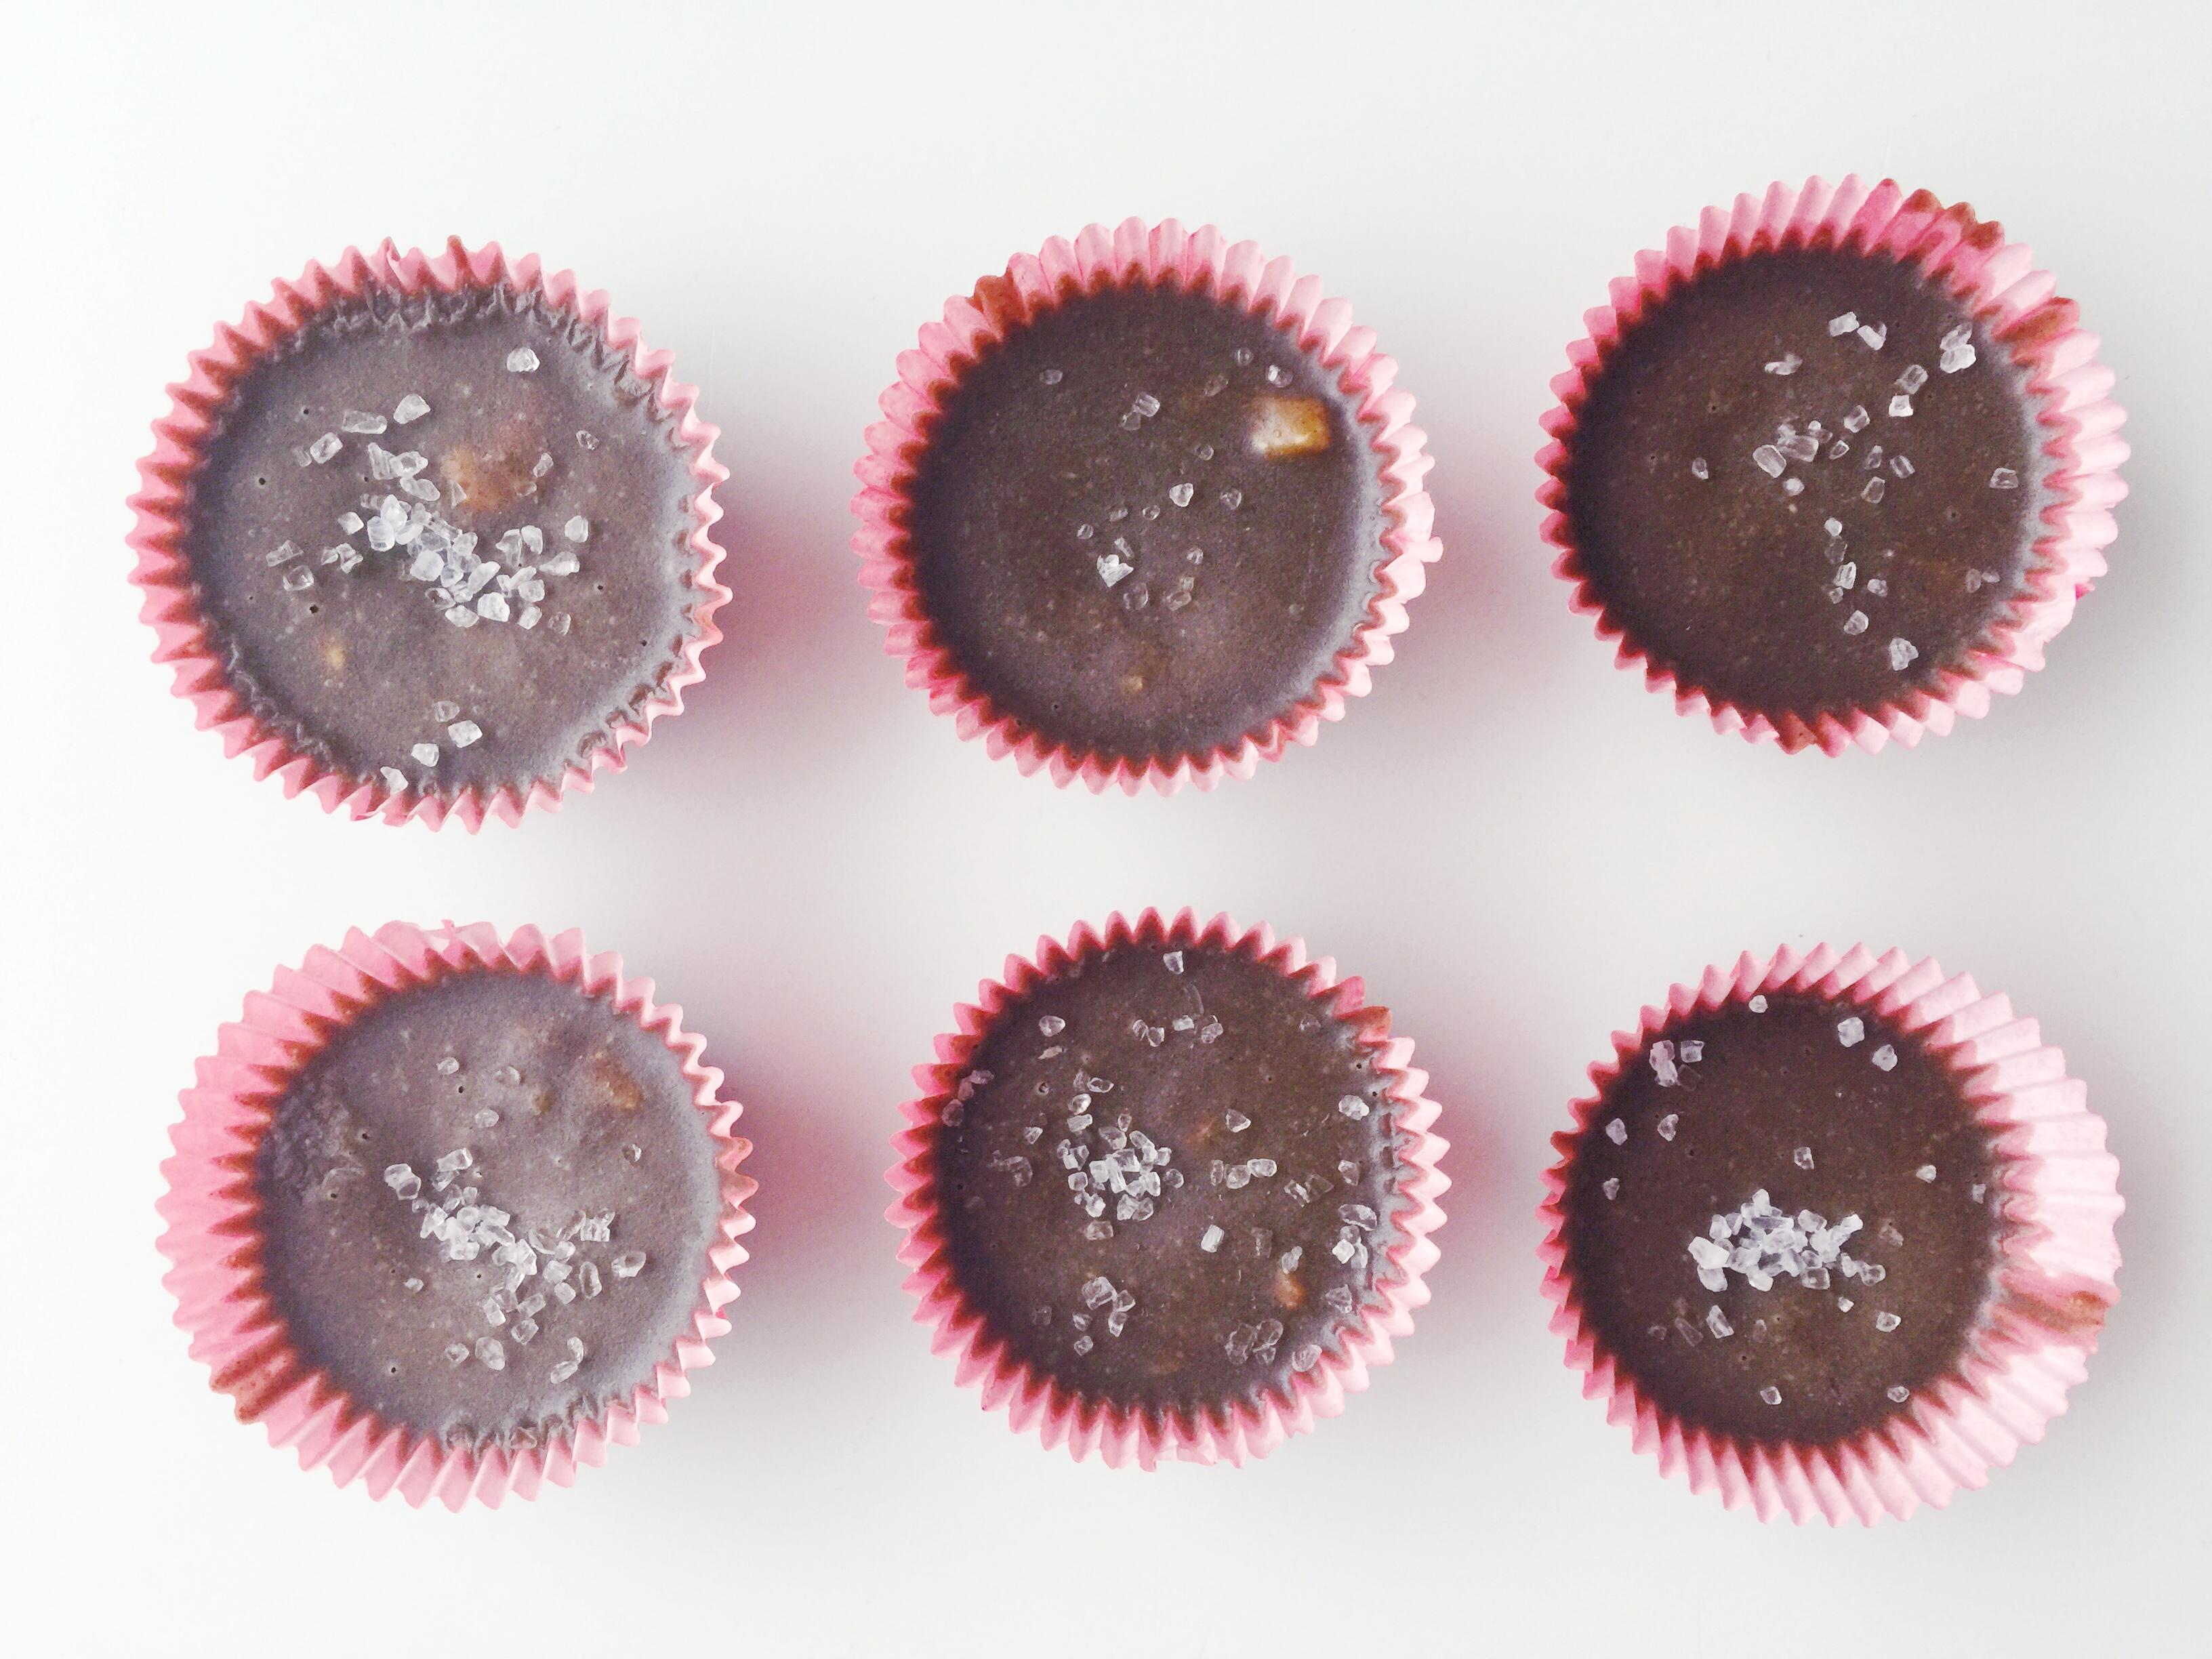 Healthy Homemade Chocolate Treats